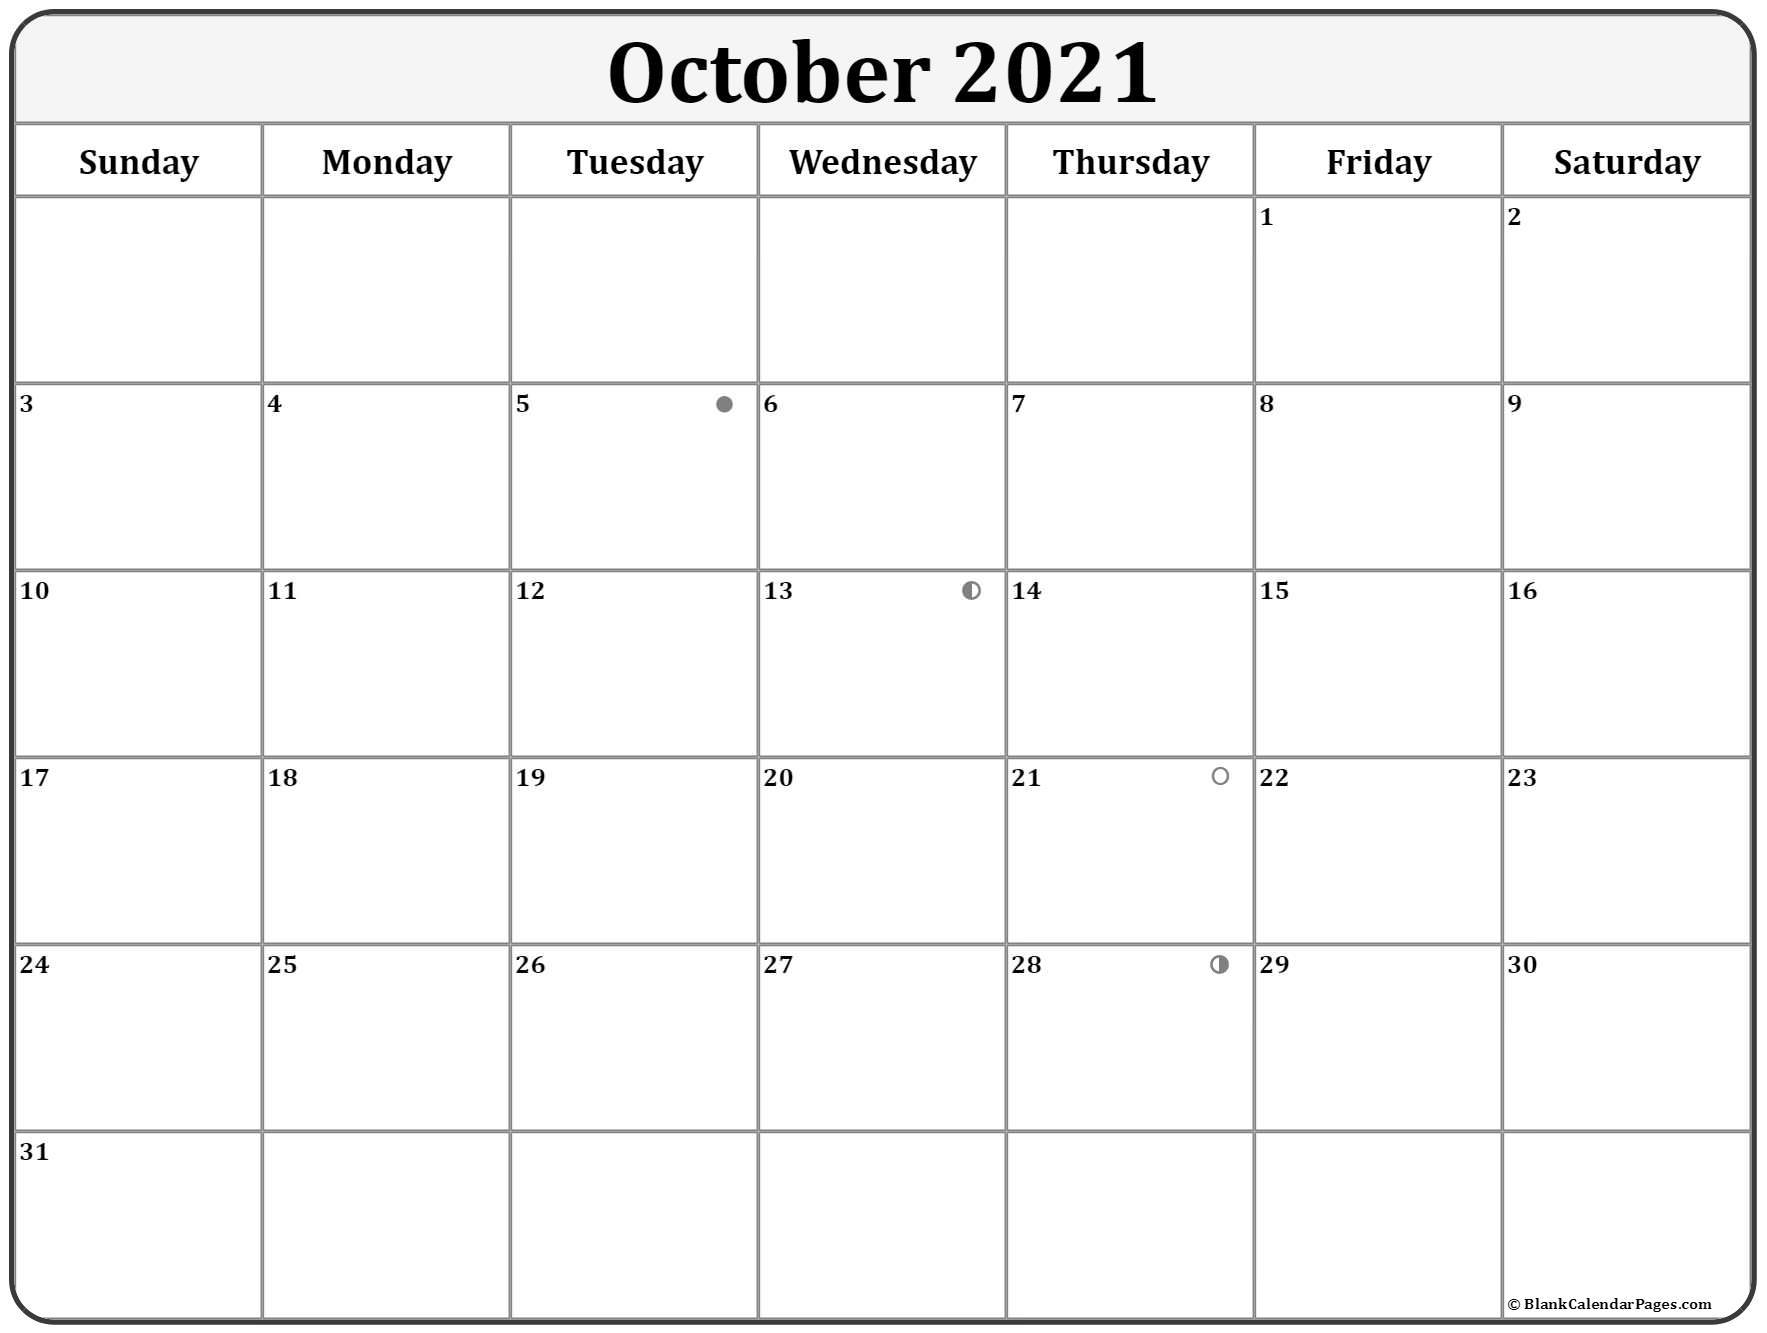 October 2021 Lunar Calendar | Moon Phase Calendar